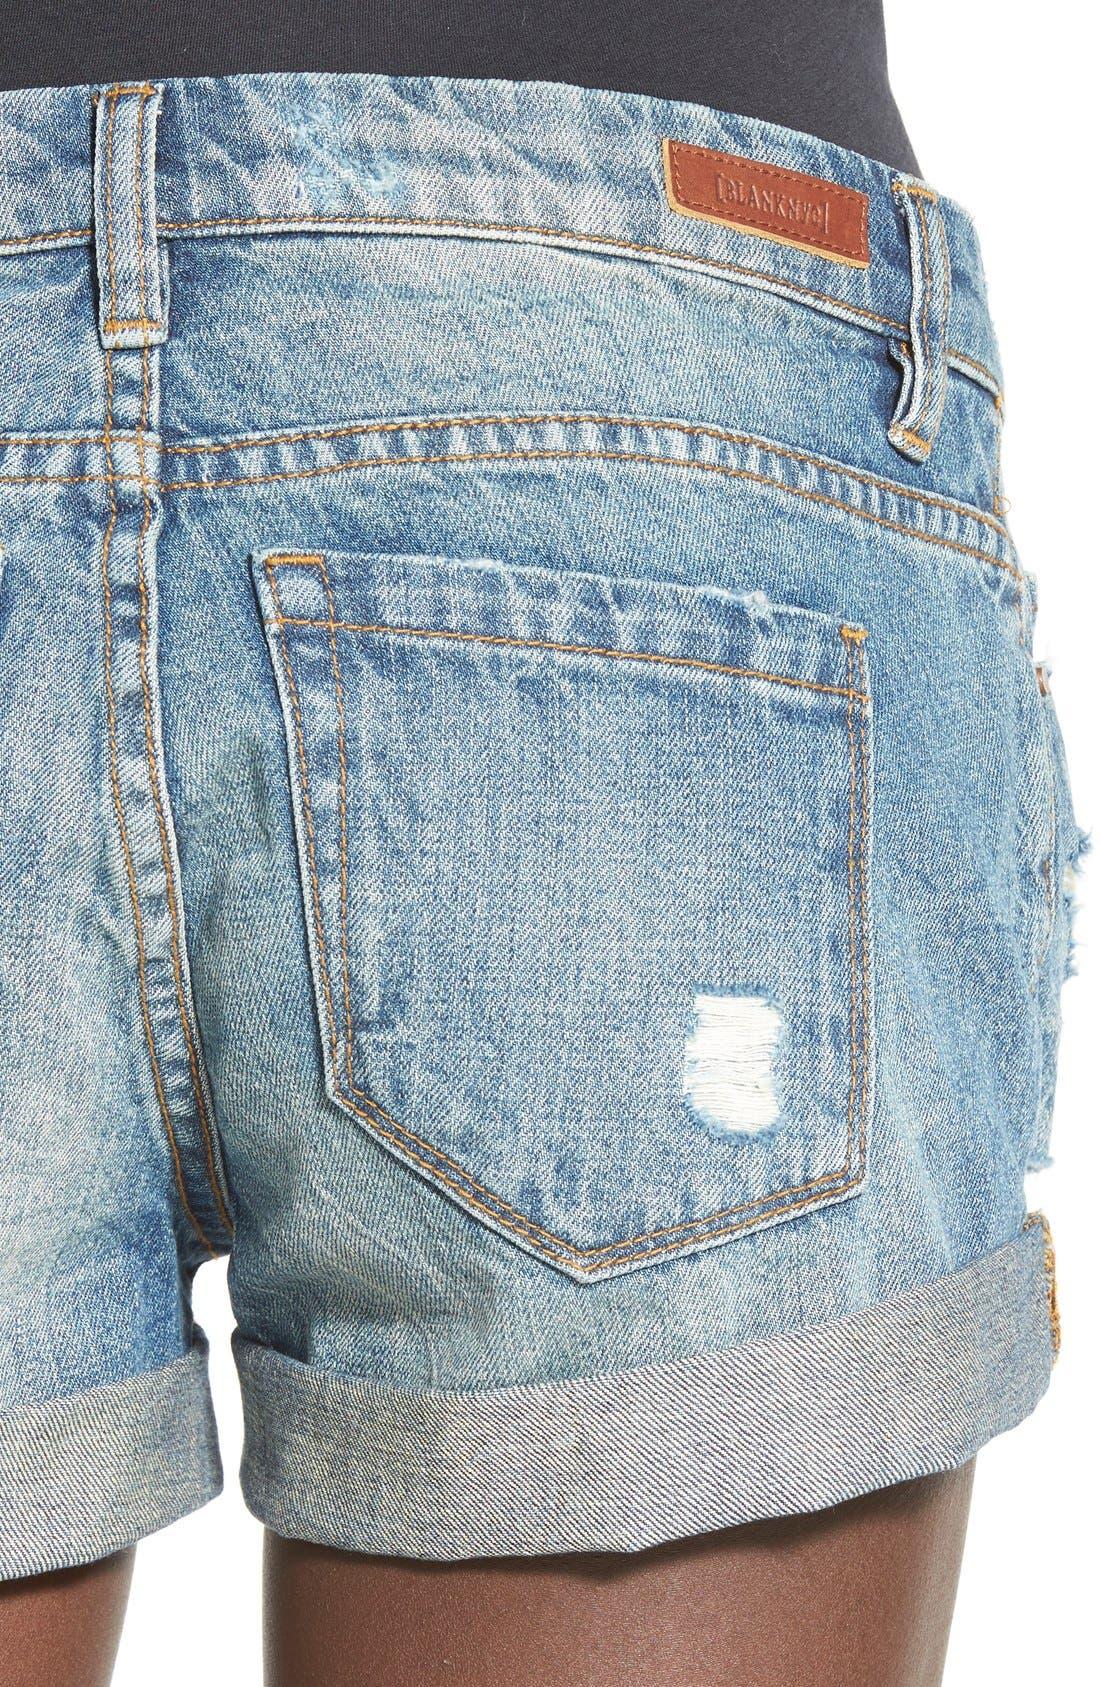 Alternate Image 4  - BLANKNYC Cuffed Distressed Denim Shorts (Low Key)